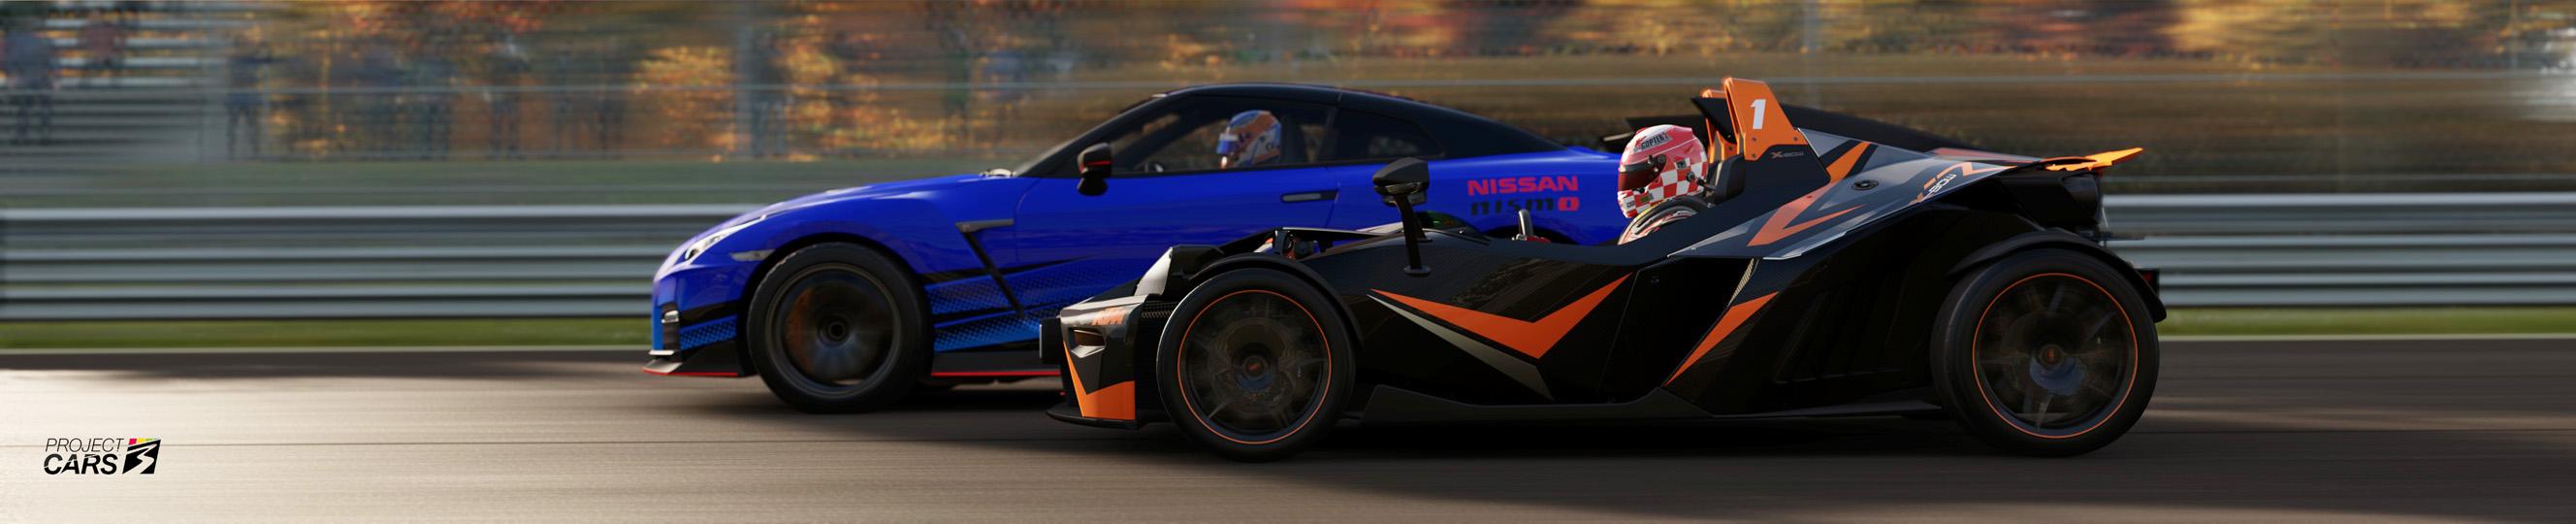 0 PROJECT CARS 3 KTM X BowR at MONZA SHORT crop copy.jpg